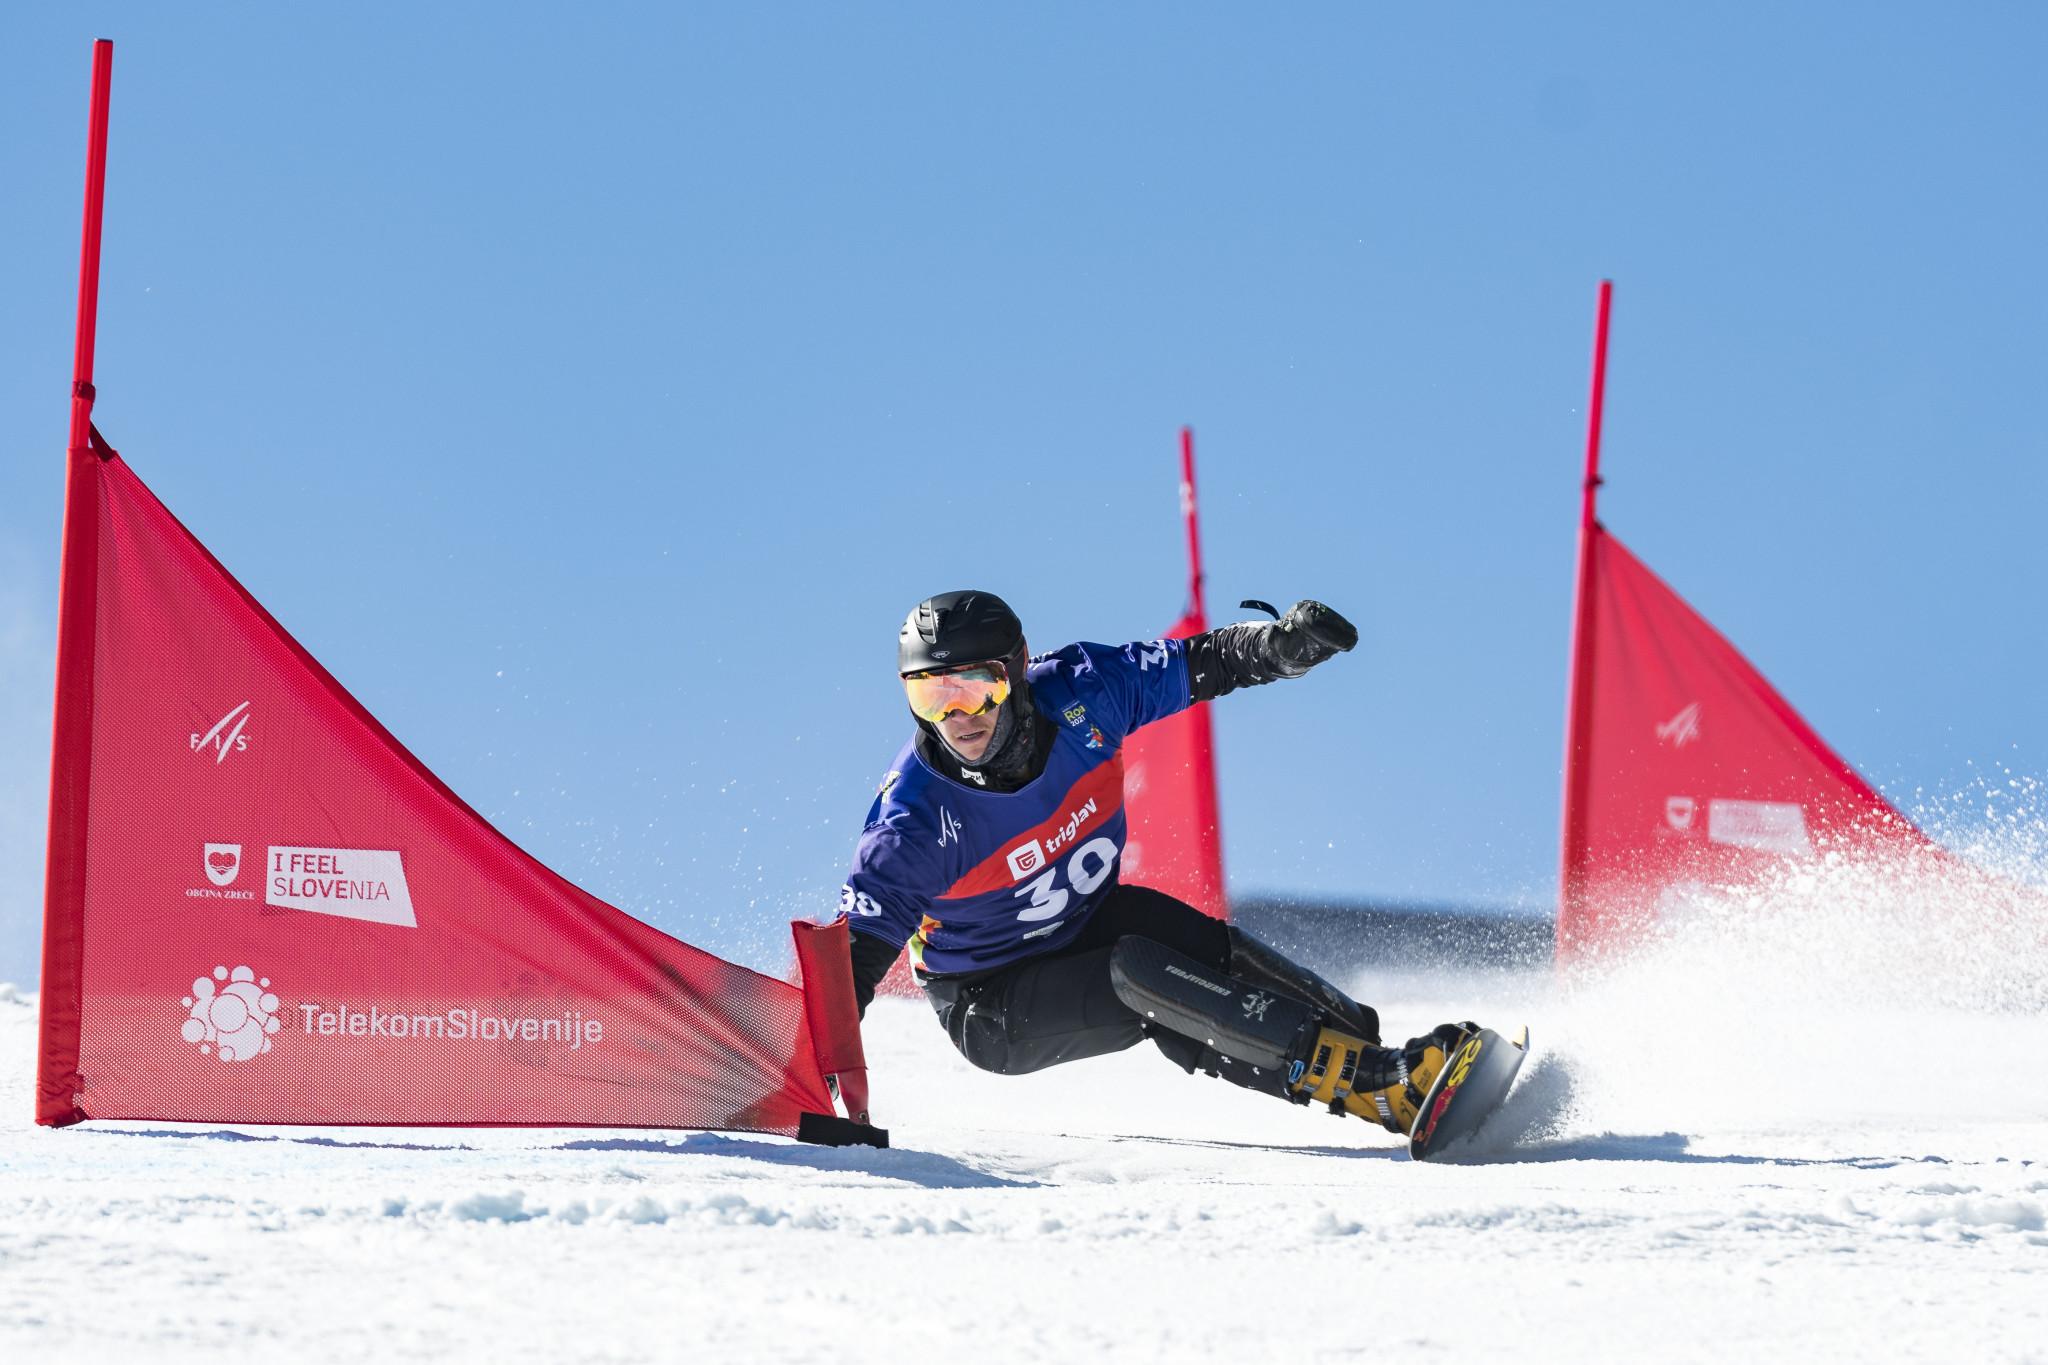 World champion Loginov seeking more snowboard parallel slalom success in Rogla